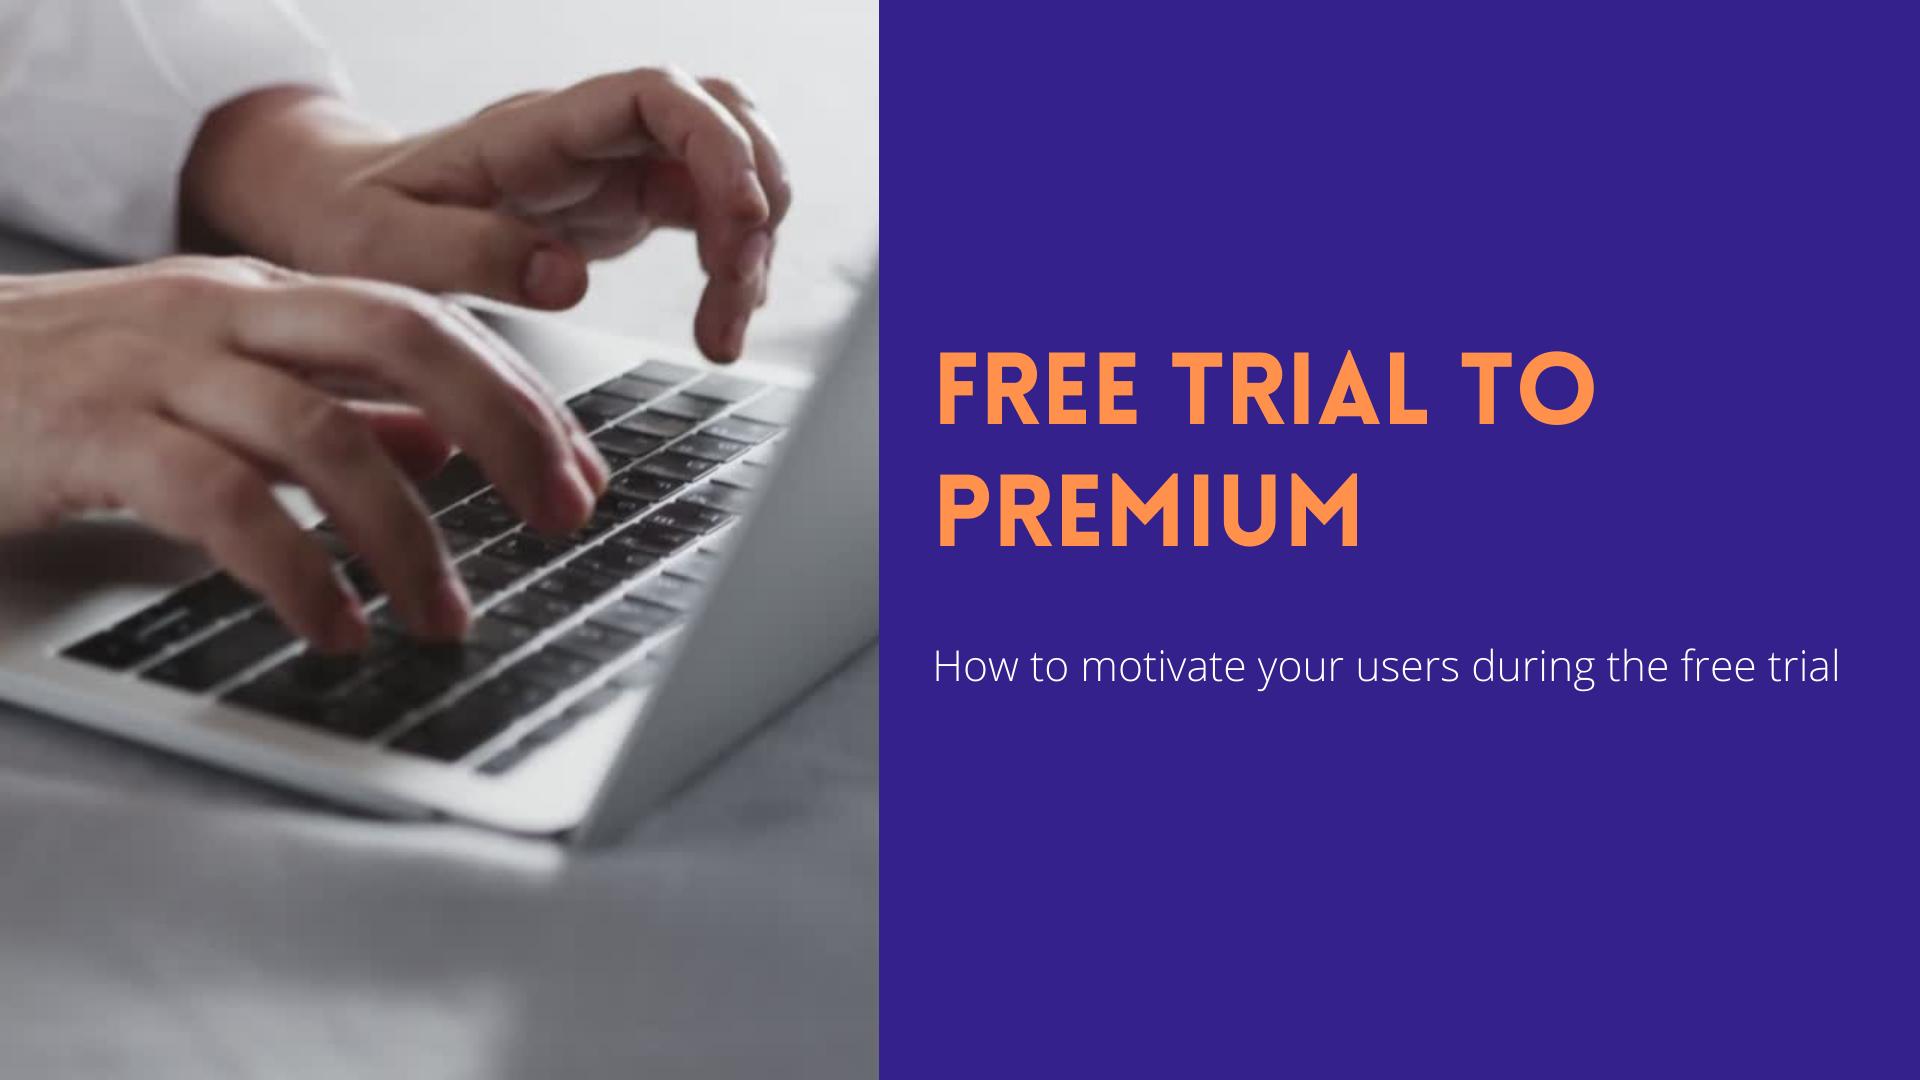 How to motivate free trial users to preimum_Dashfrugal